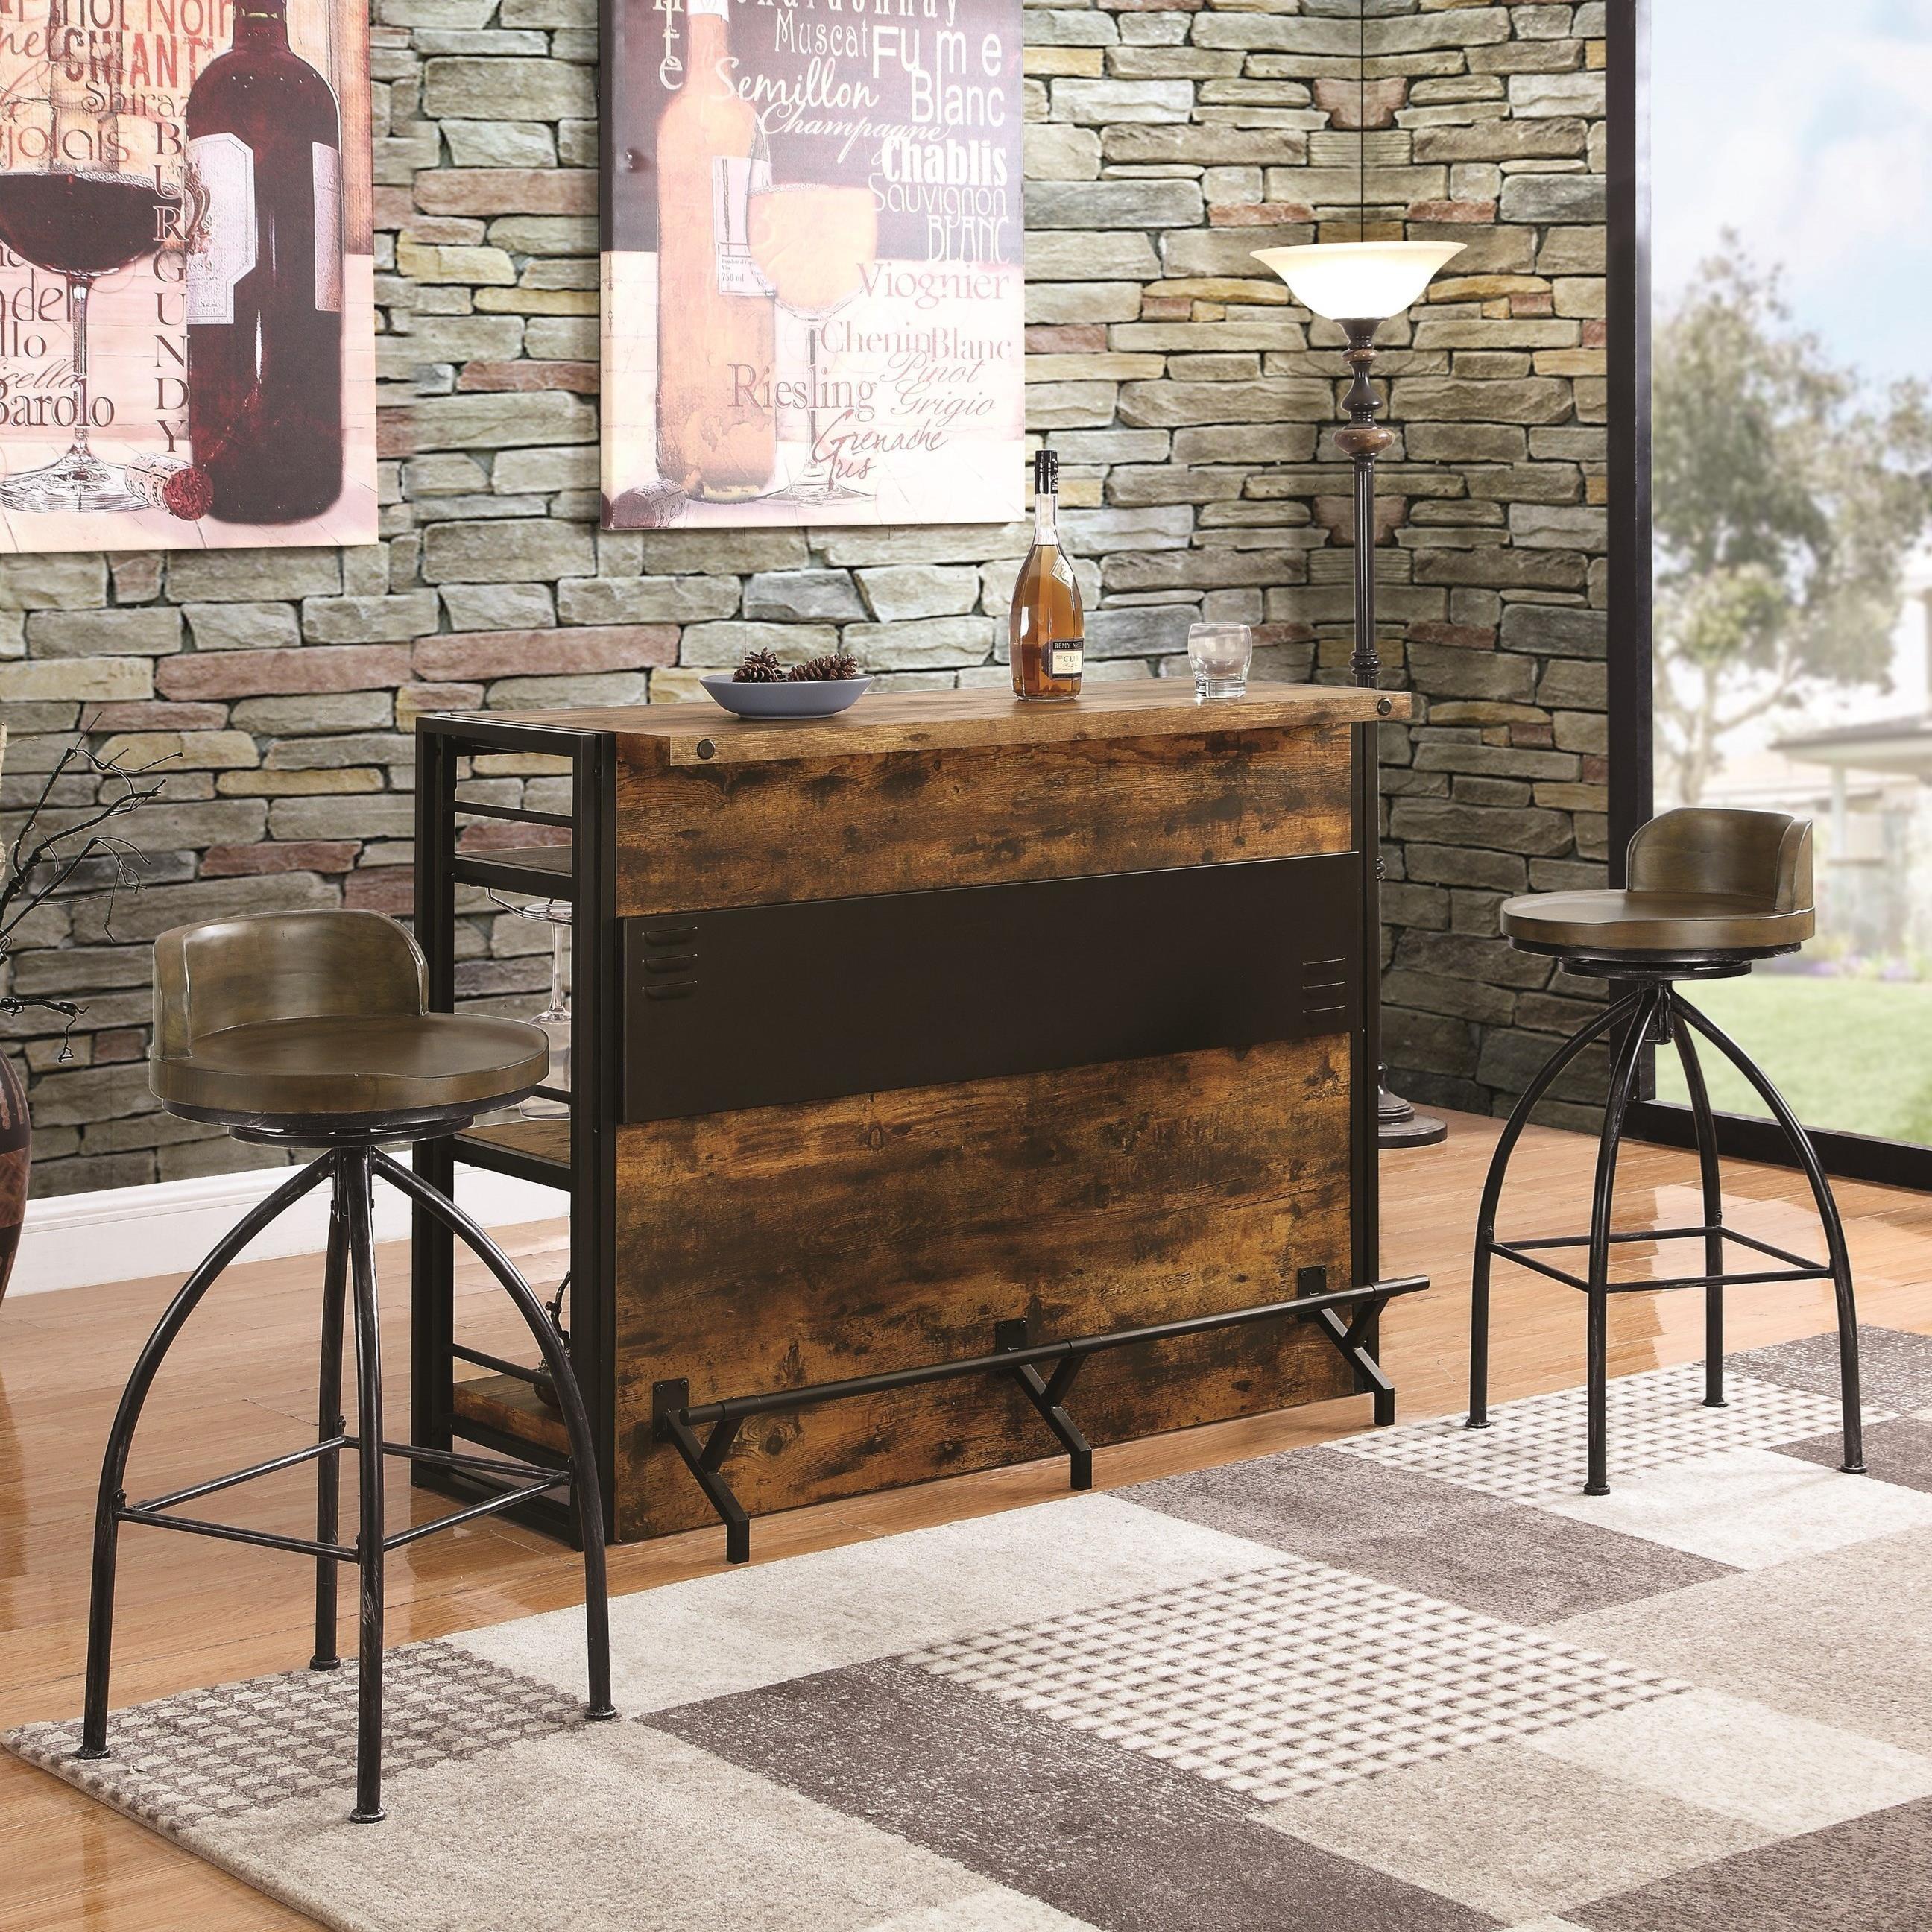 Bar Furniture Store: Coaster #130071 Antique Nutmeg Rustic Bar Unit And Stools